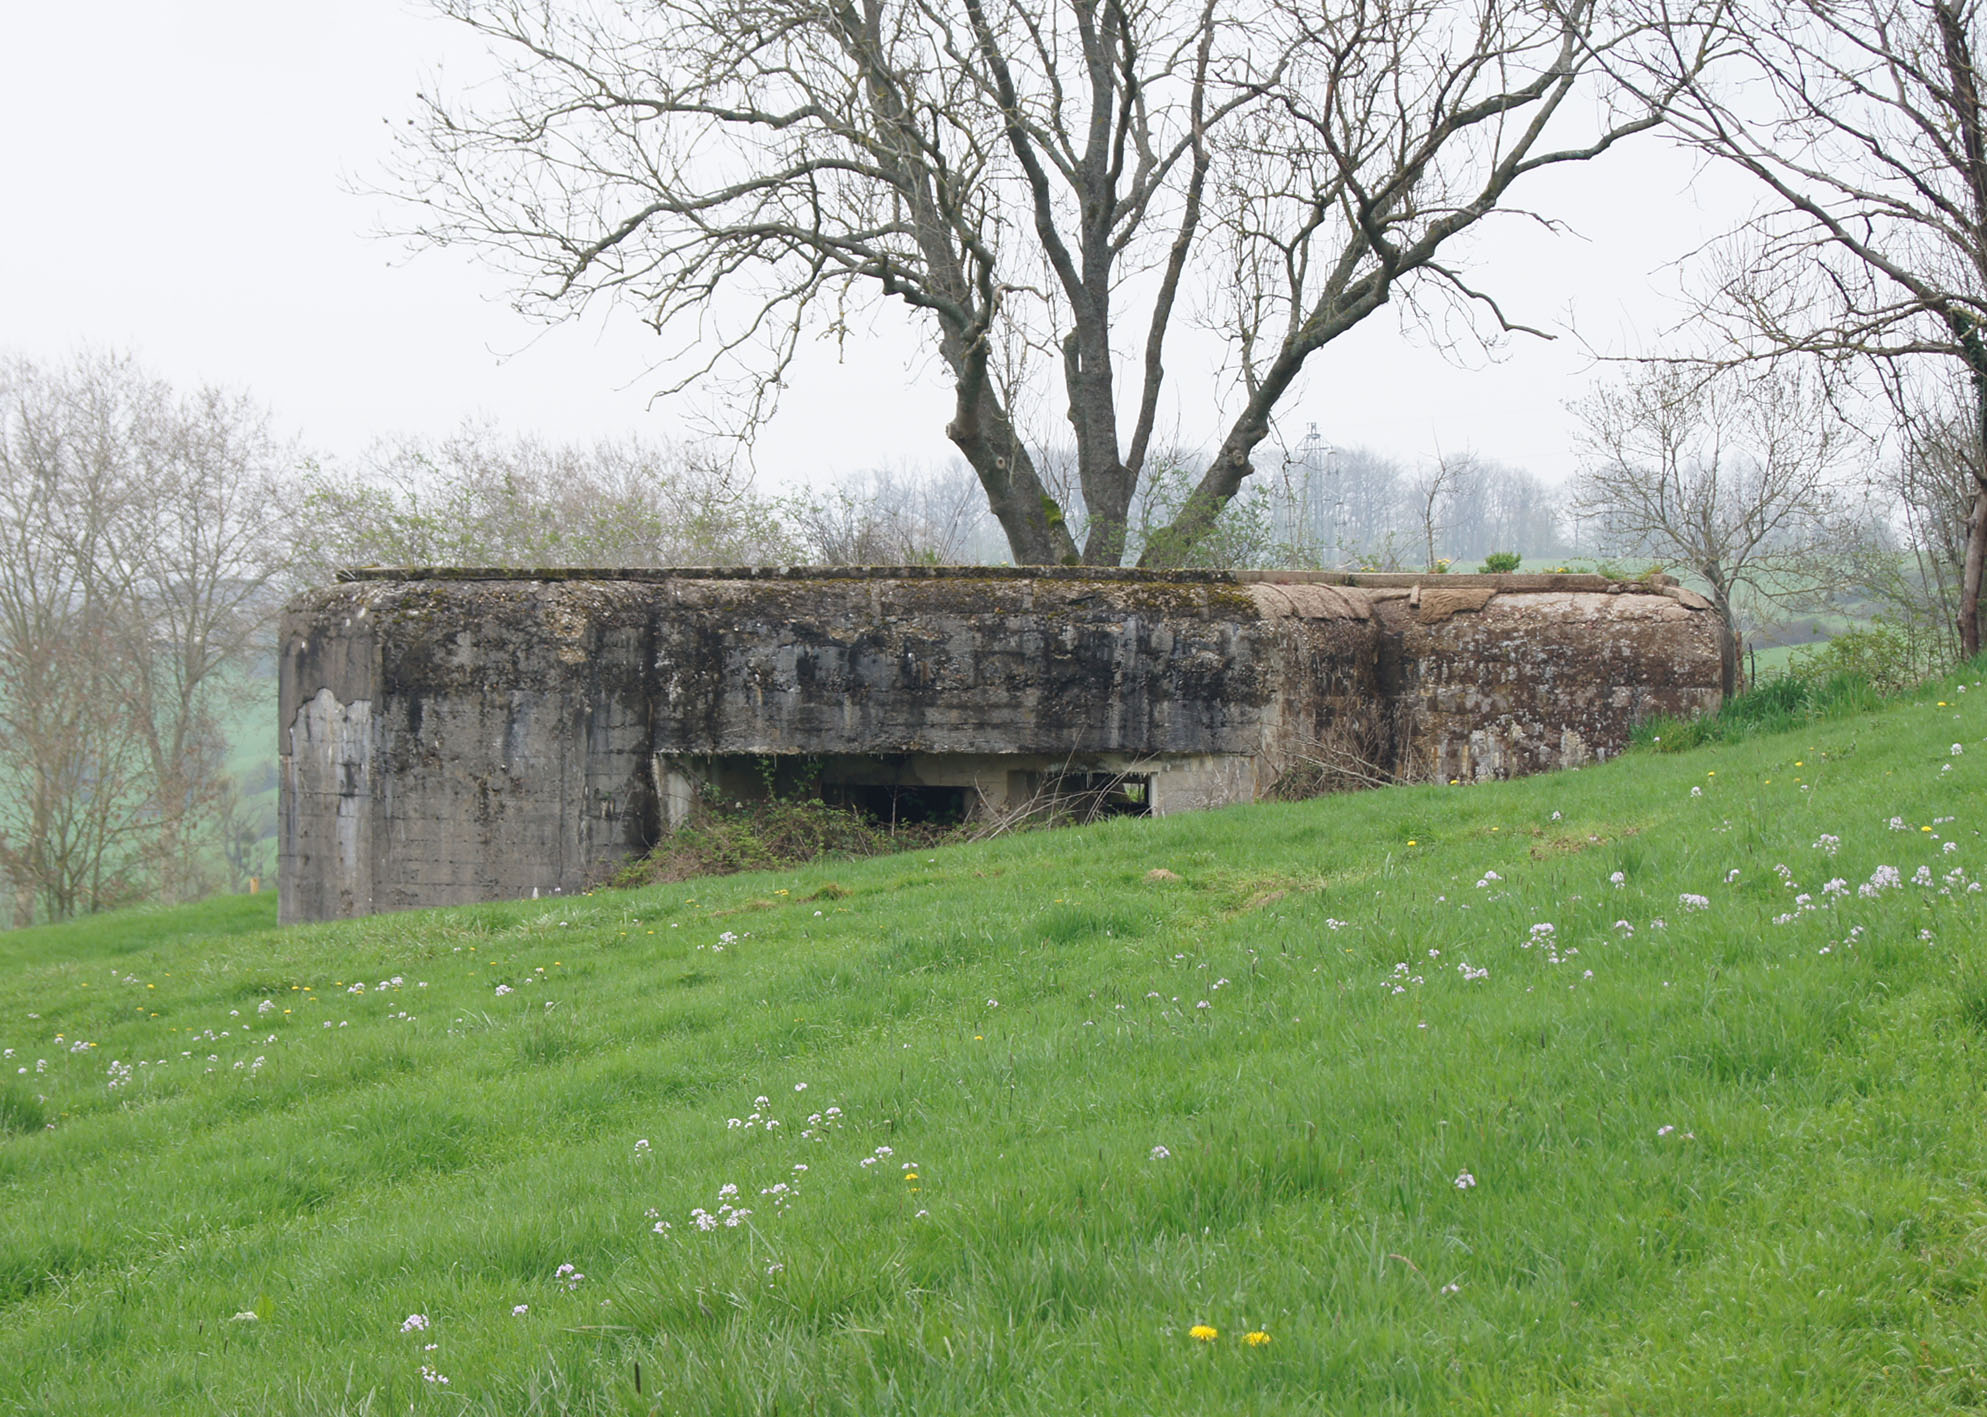 Artillerie-Kasematte auf dem Südufer der Maas bei Sedan